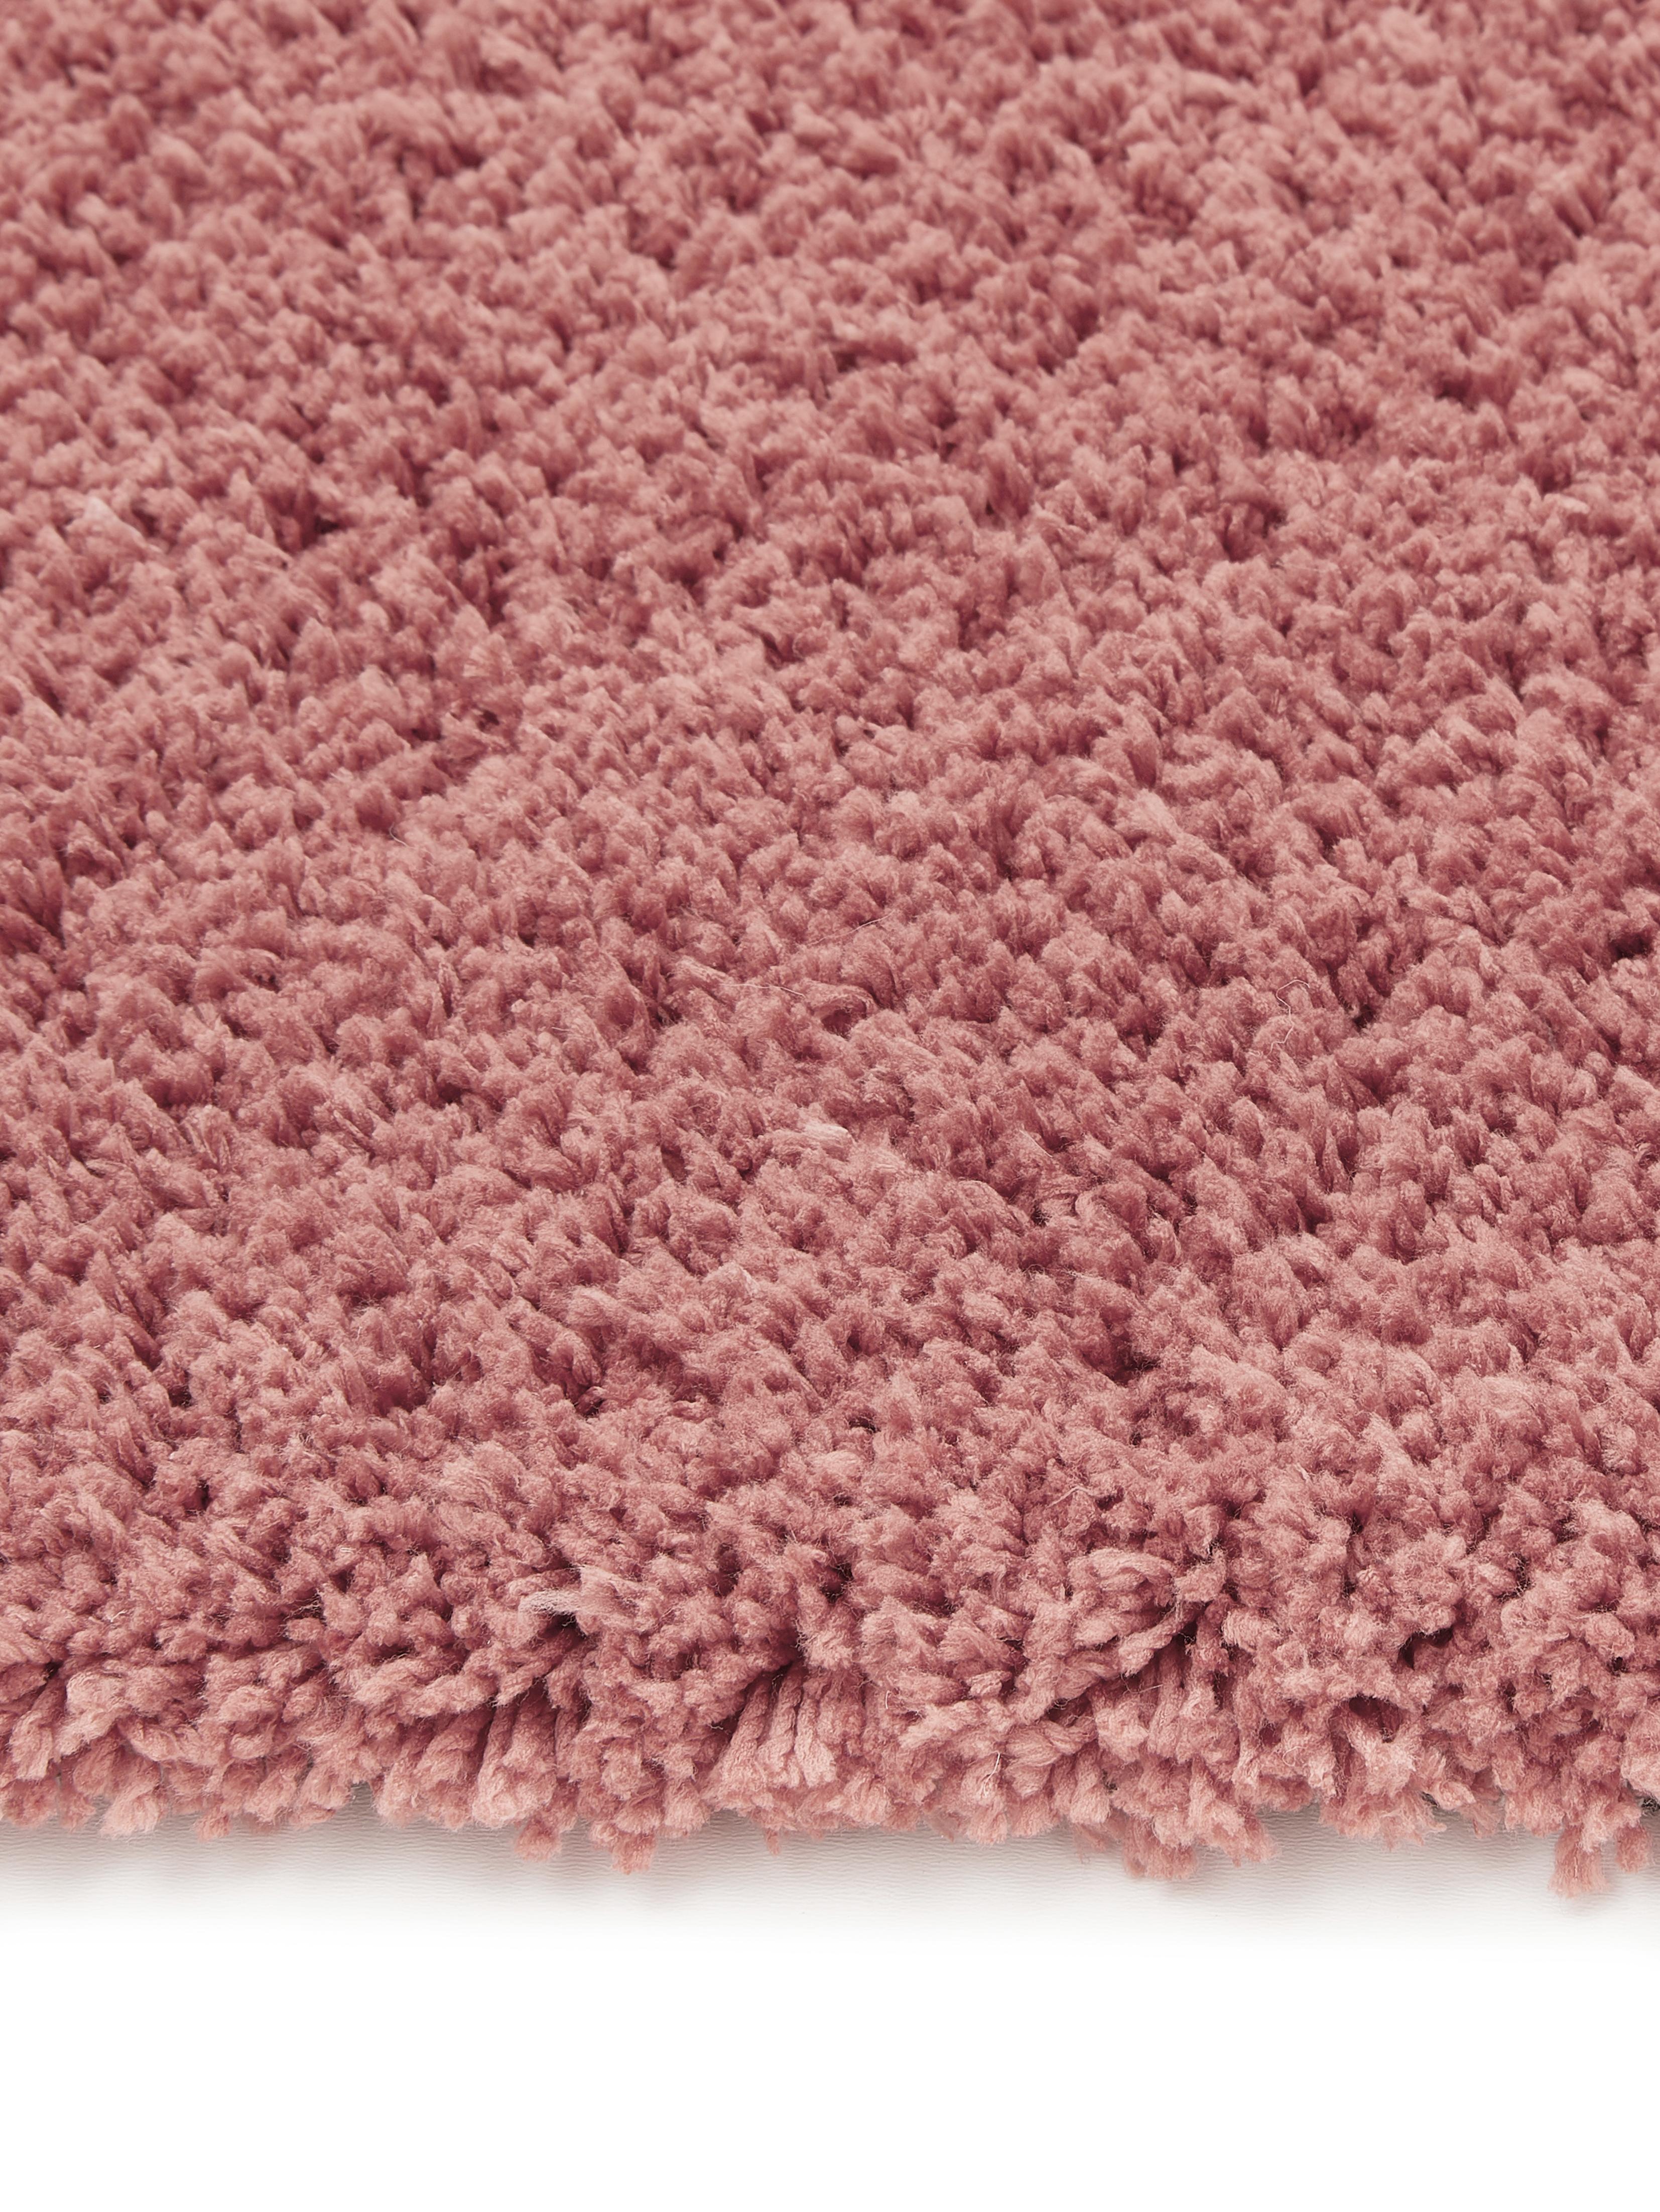 Pluizig hoogpolig vloerkleed Leighton in terracotta kleur, Bovenzijde: 100% polyester (microveze, Onderzijde: 70% polyester, 30% katoen, Terracotta, B 200 x L 300 cm (maat L)